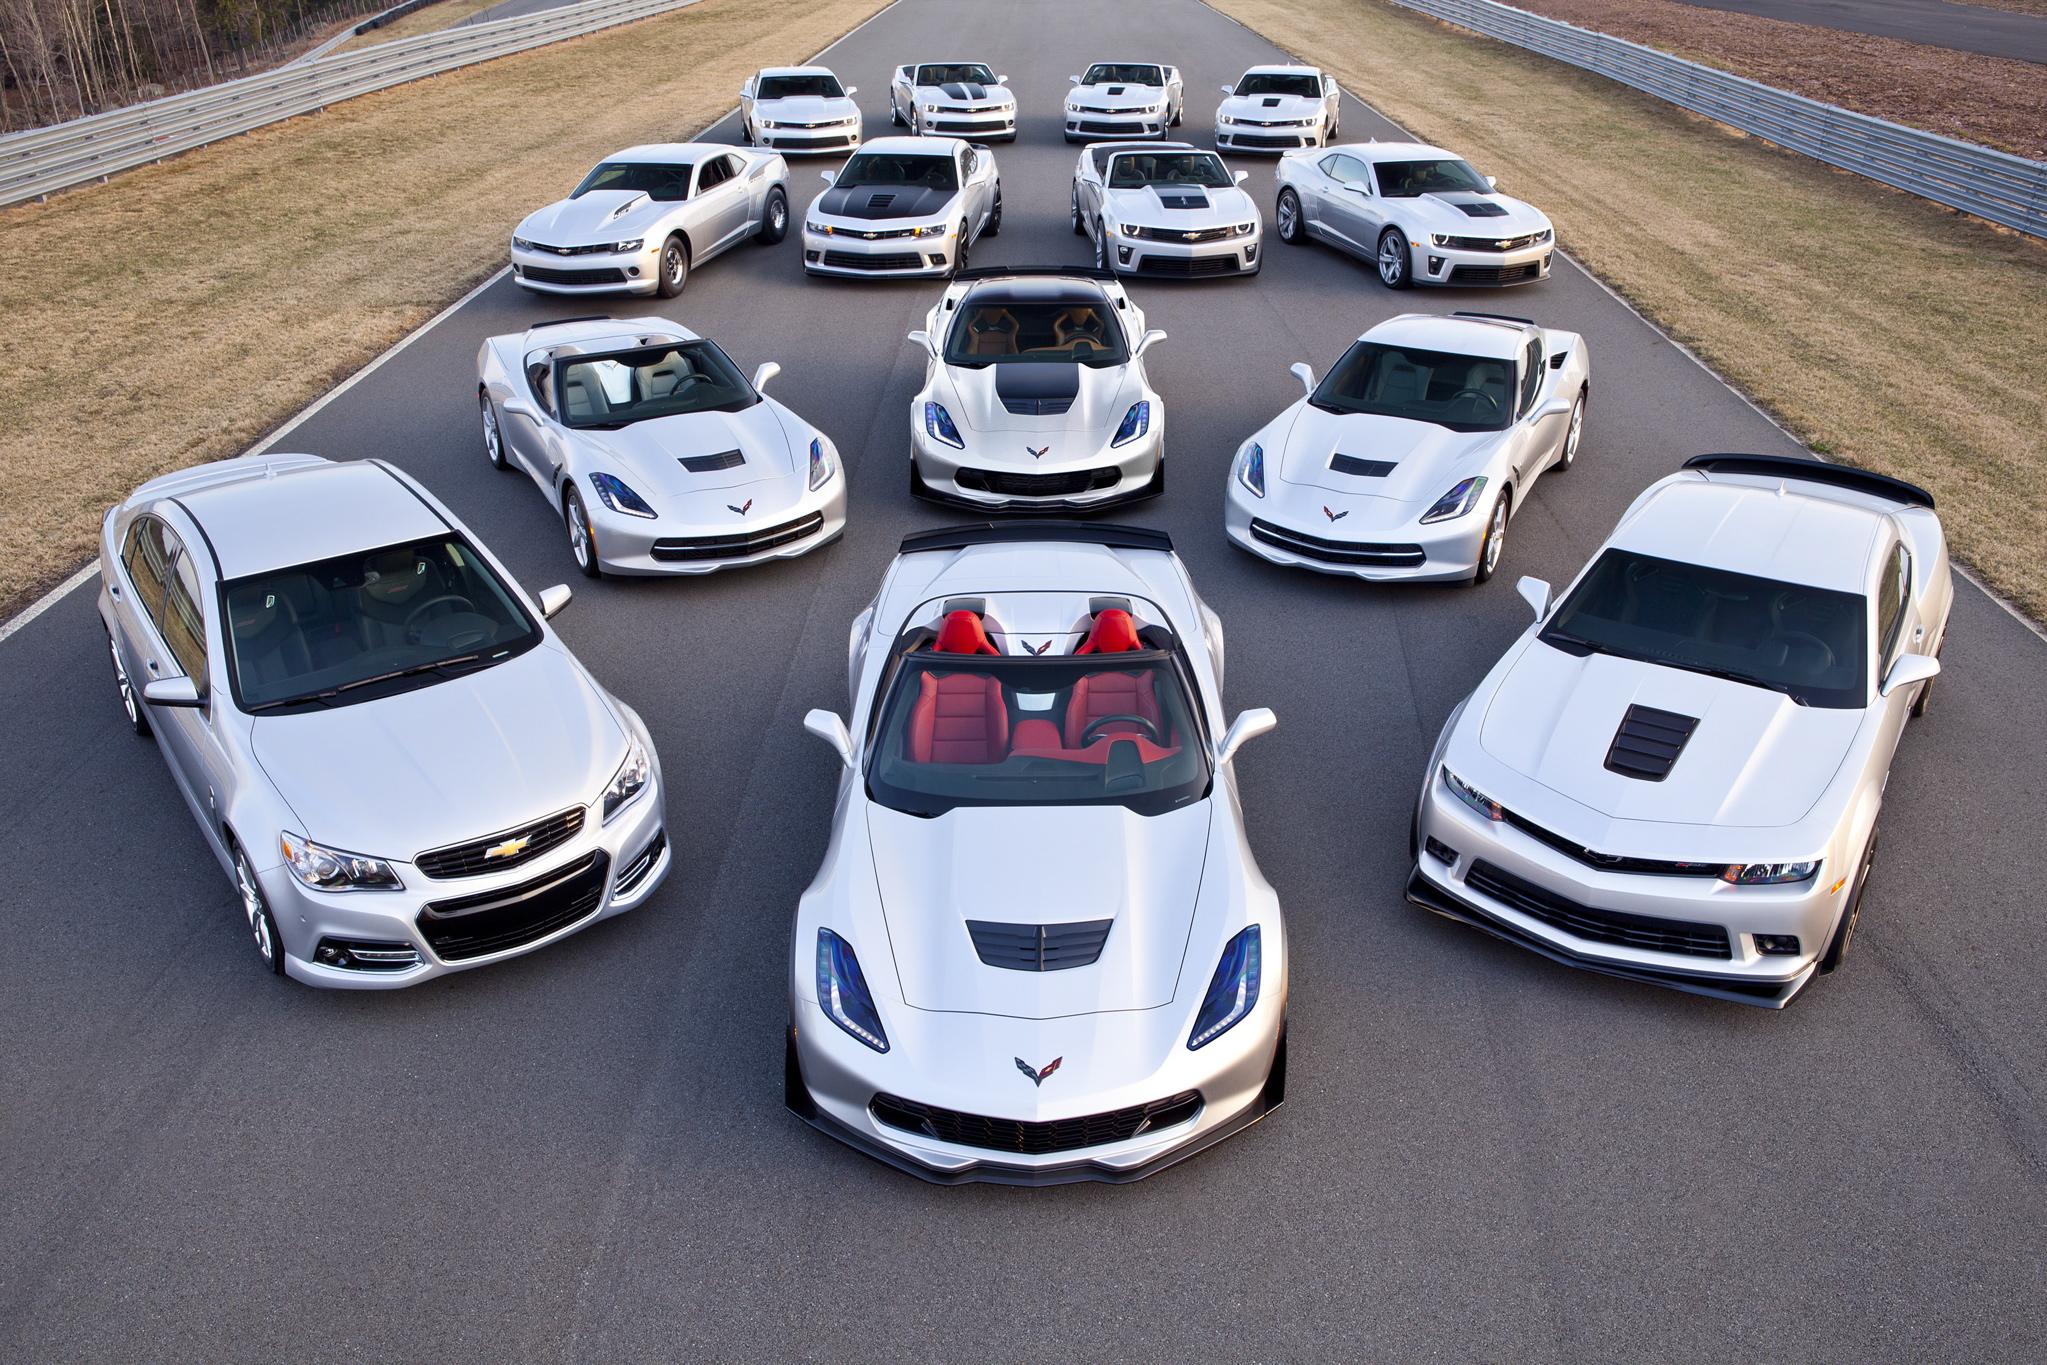 صورة صور سيارات 2019 , بوسترات عربيات 2019